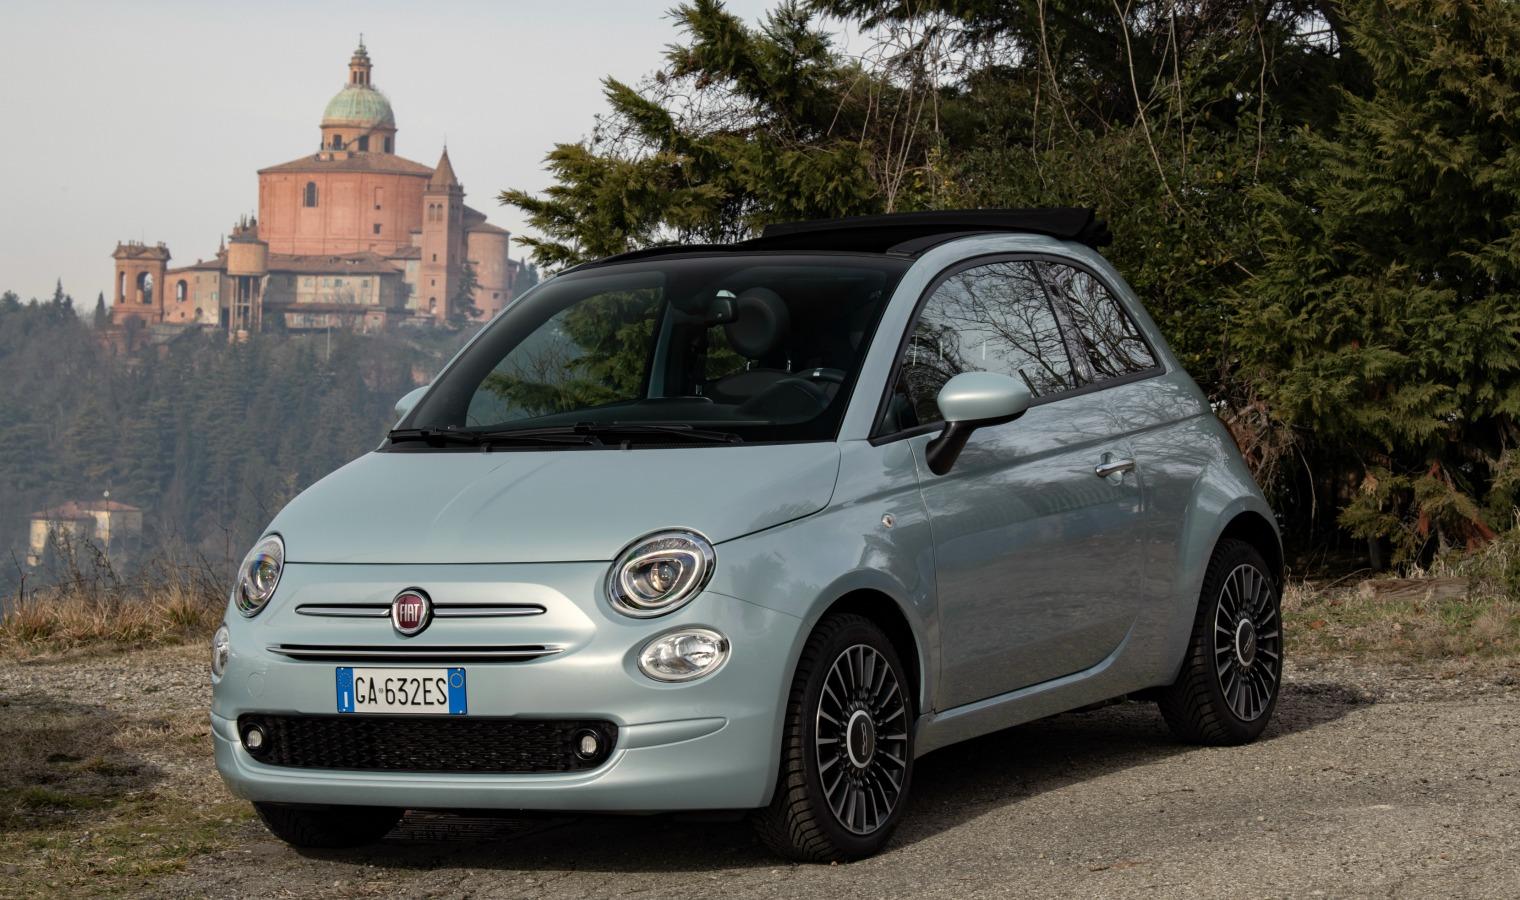 Nuova-Fiat-500-Hybrid a noleggio lungo termine